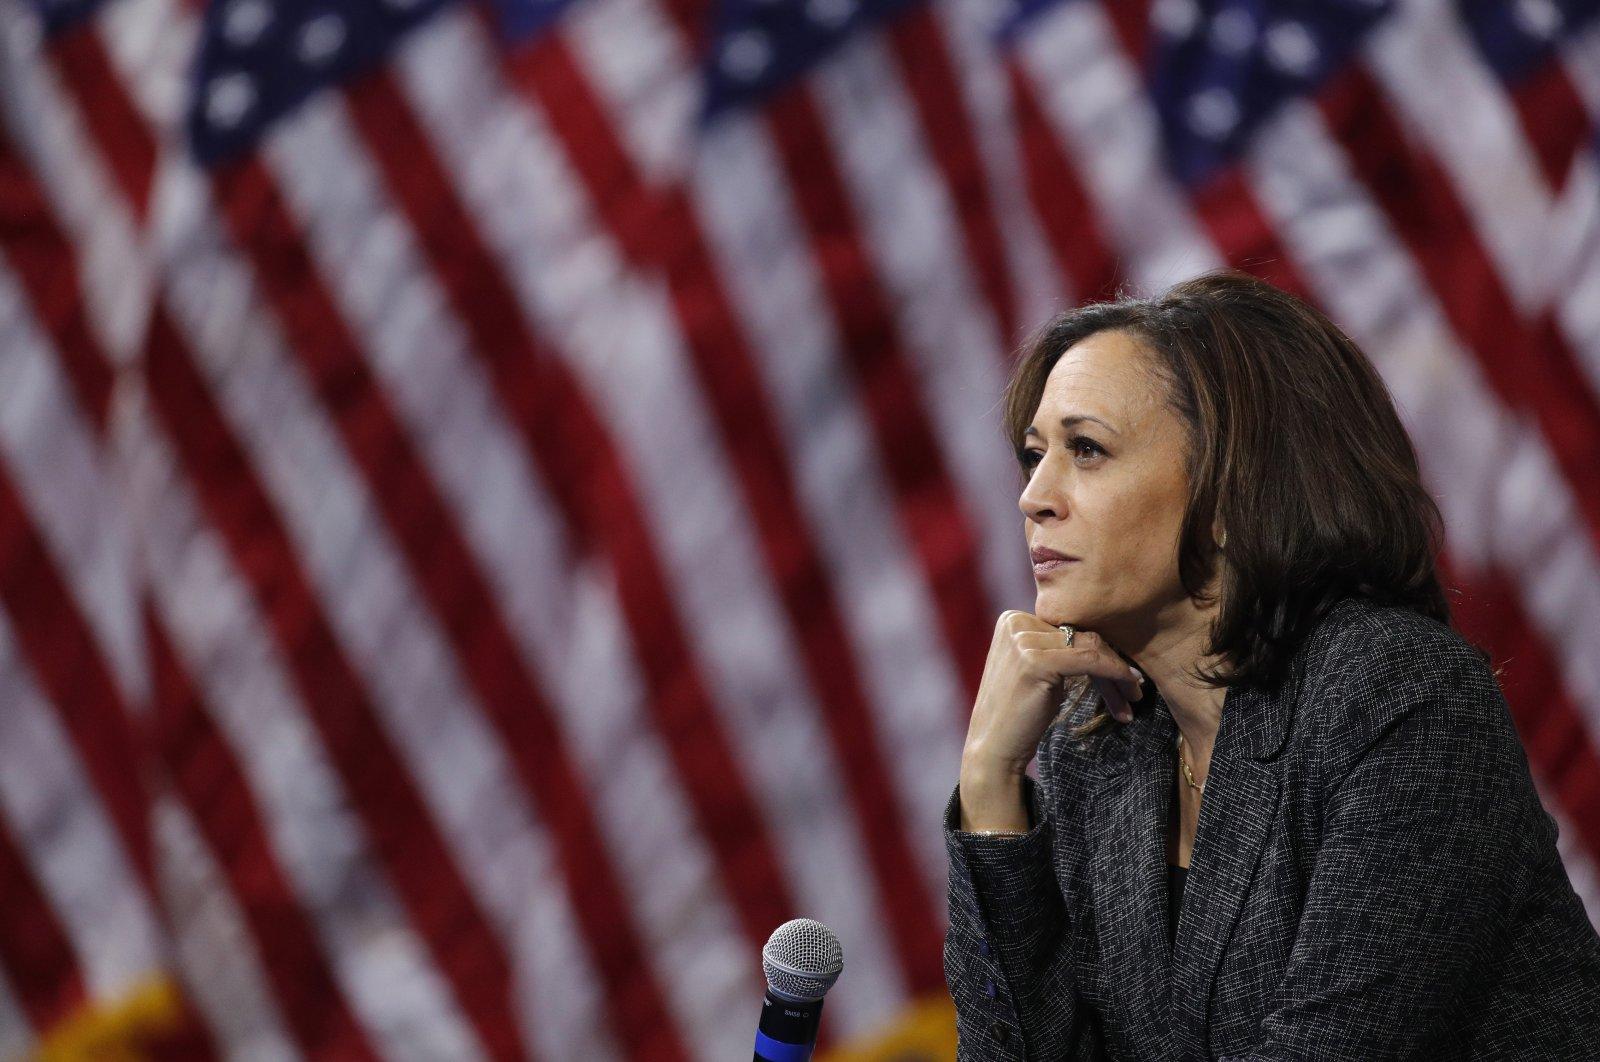 U.S. Sen. Kamala Harris listens during a gun safety forum in Las Vegas, Nevada, U.S., Oct. 2, 2019. (AP Photo)